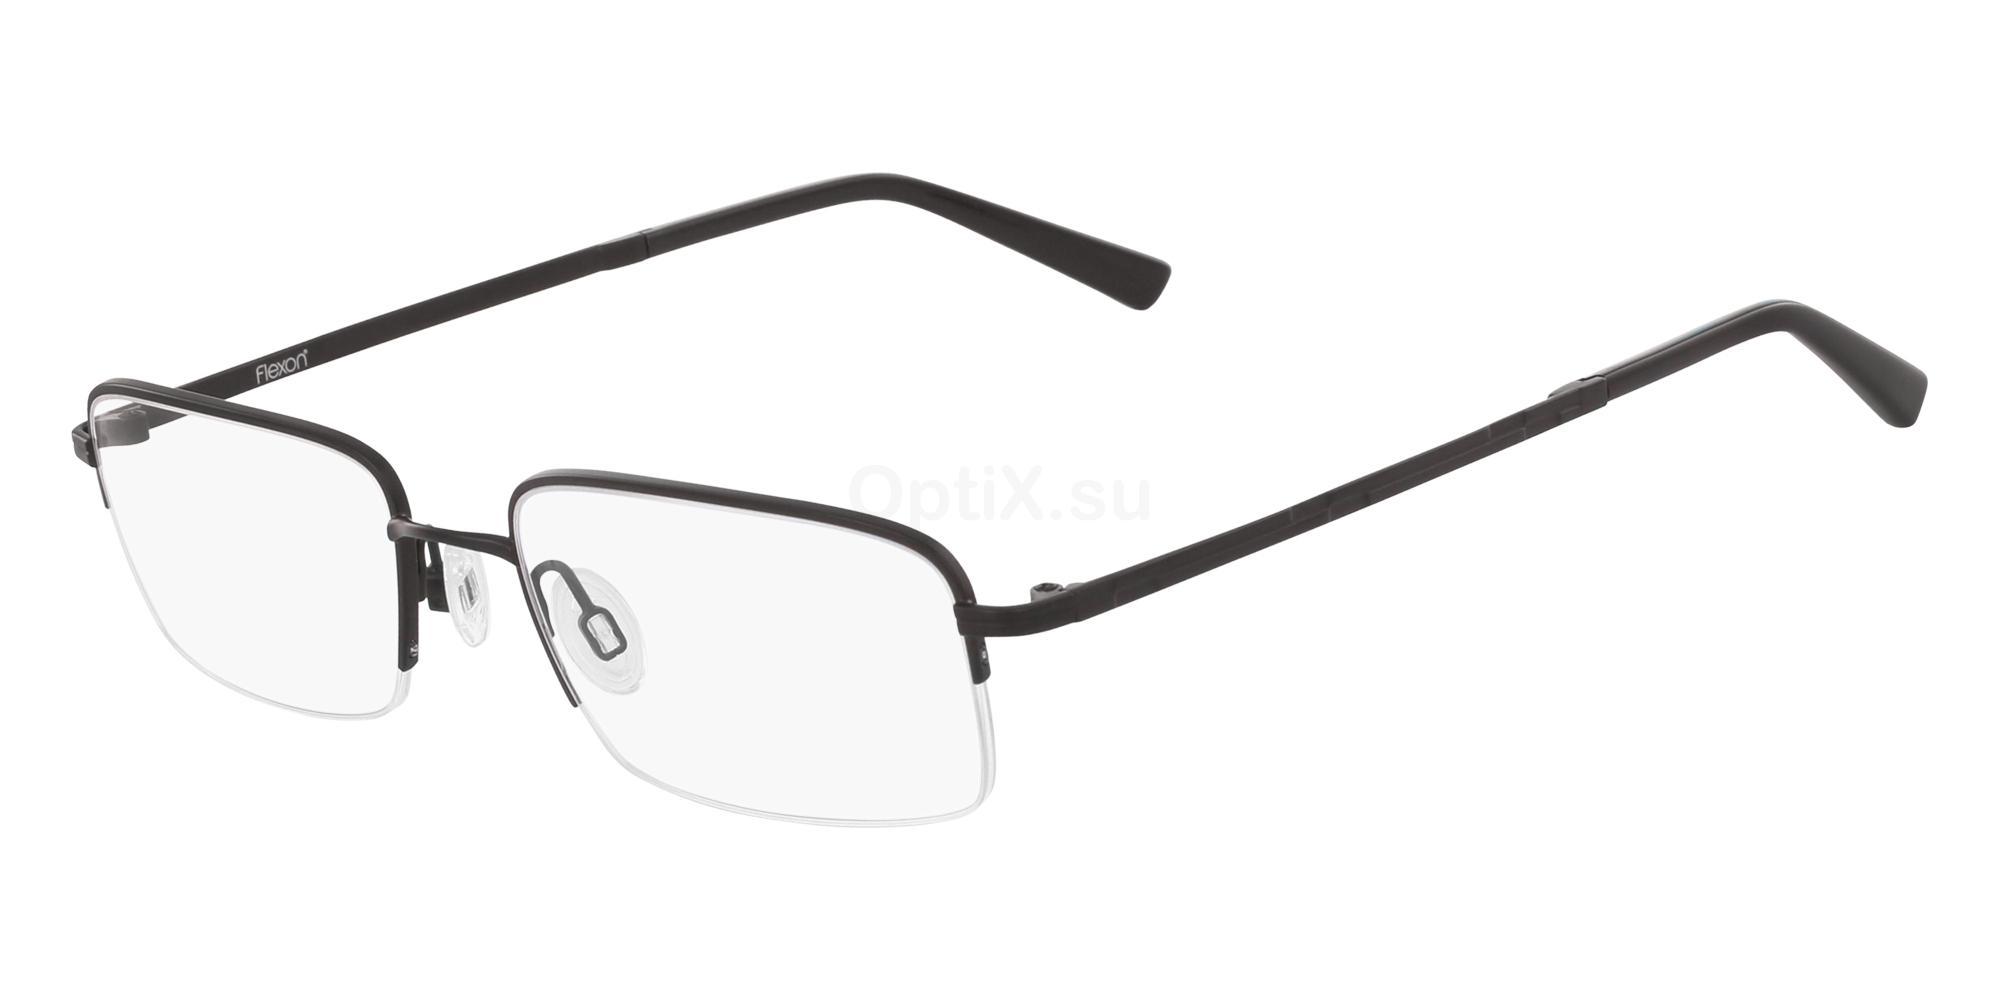 001 FLEXON ELLISON 600 Glasses, Flexon